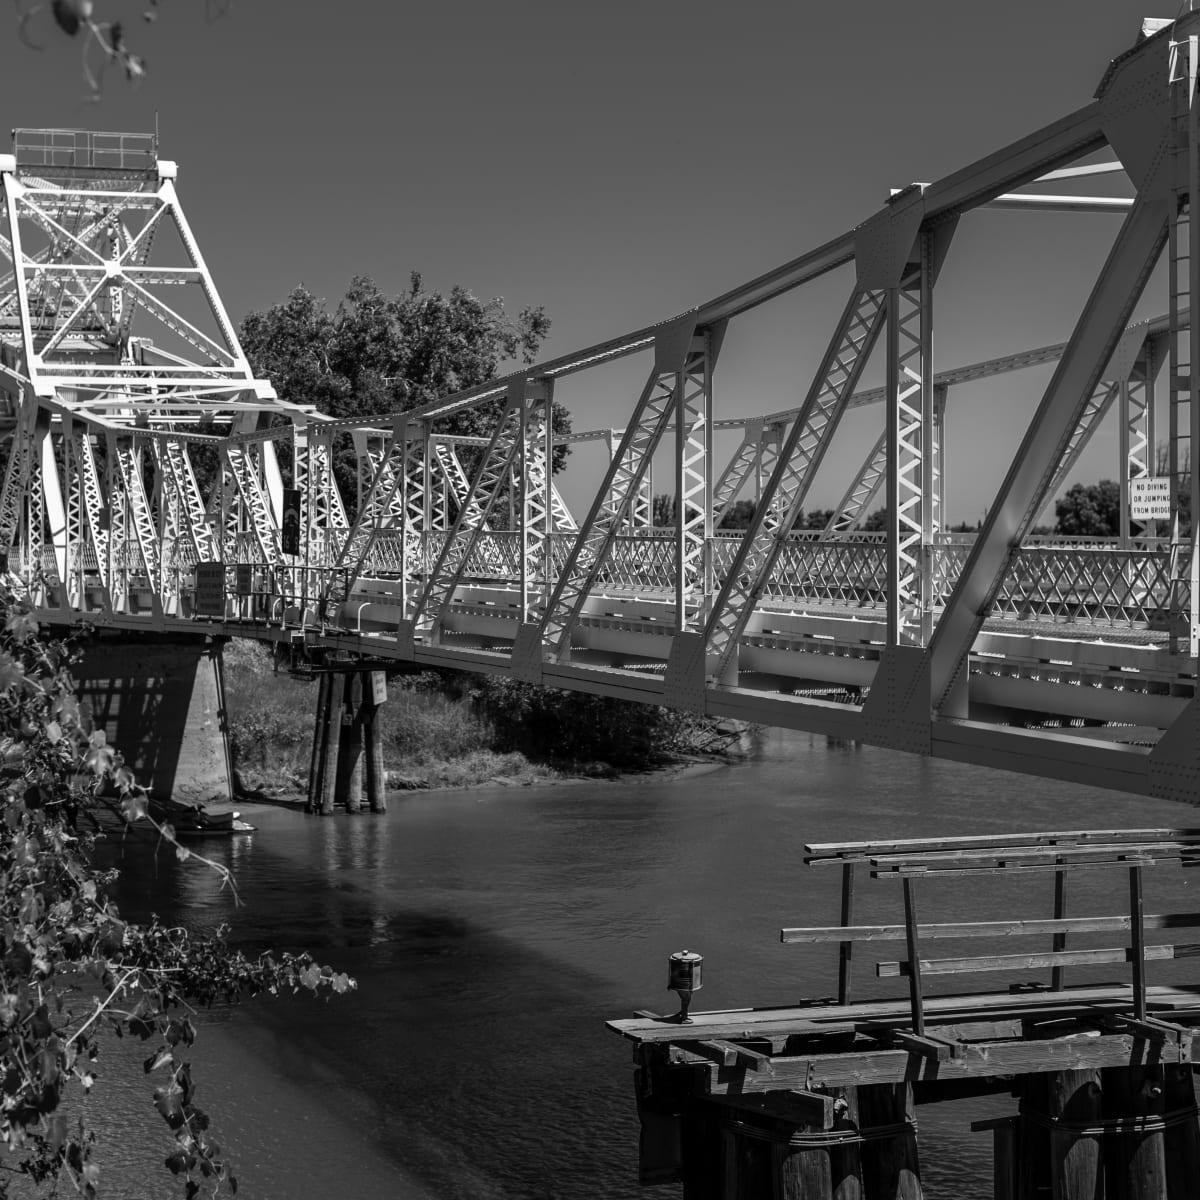 Steamboat Bridge #2 by Farrell Scott